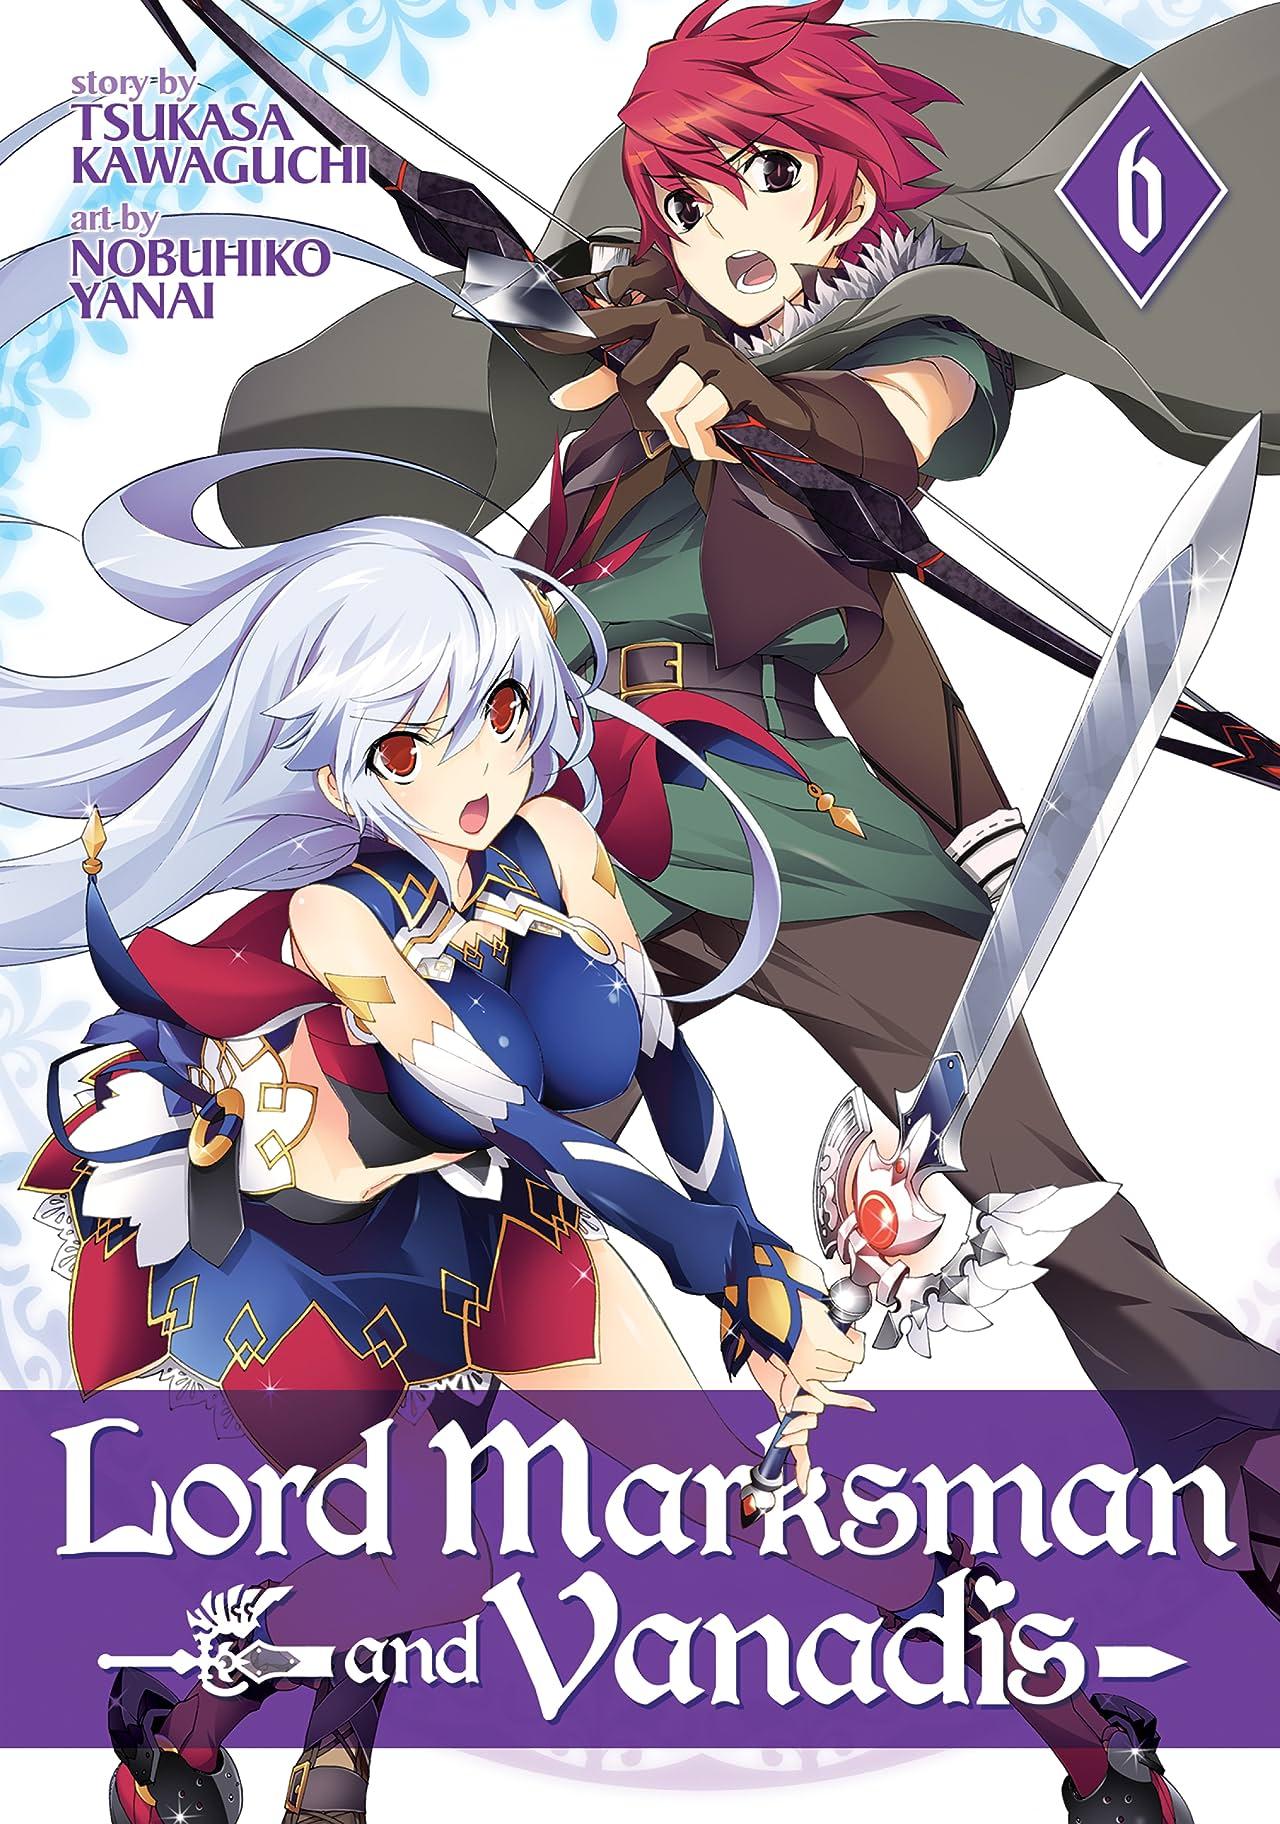 Lord Marksman and Vanadis Vol. 6